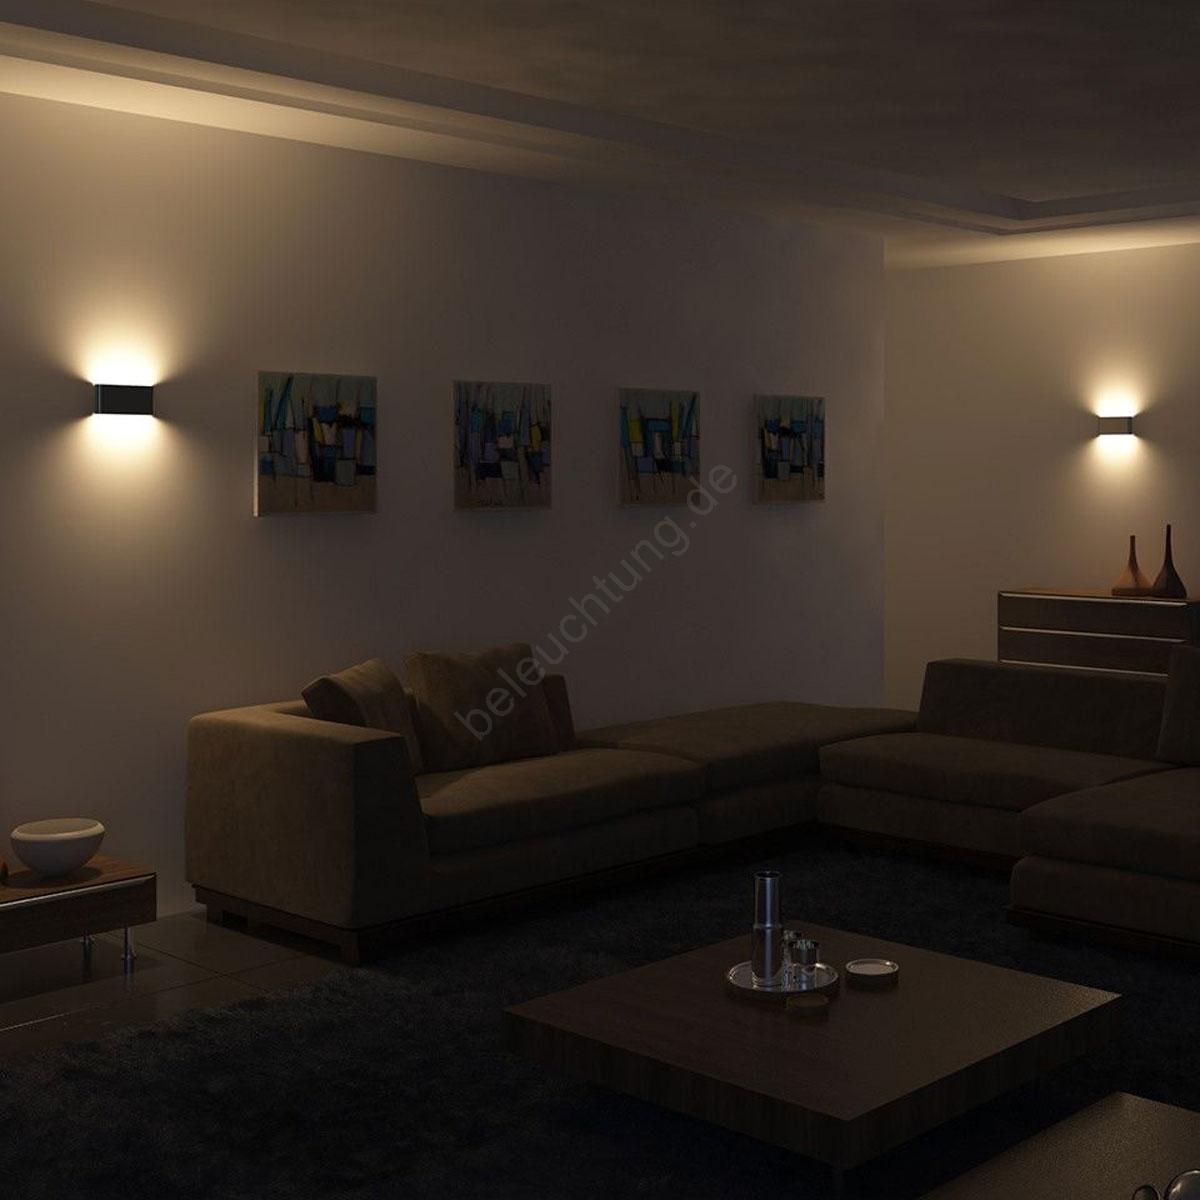 philips 45591 17 16 led wandleuchte myliving galax 4xled 2 5w 230v. Black Bedroom Furniture Sets. Home Design Ideas